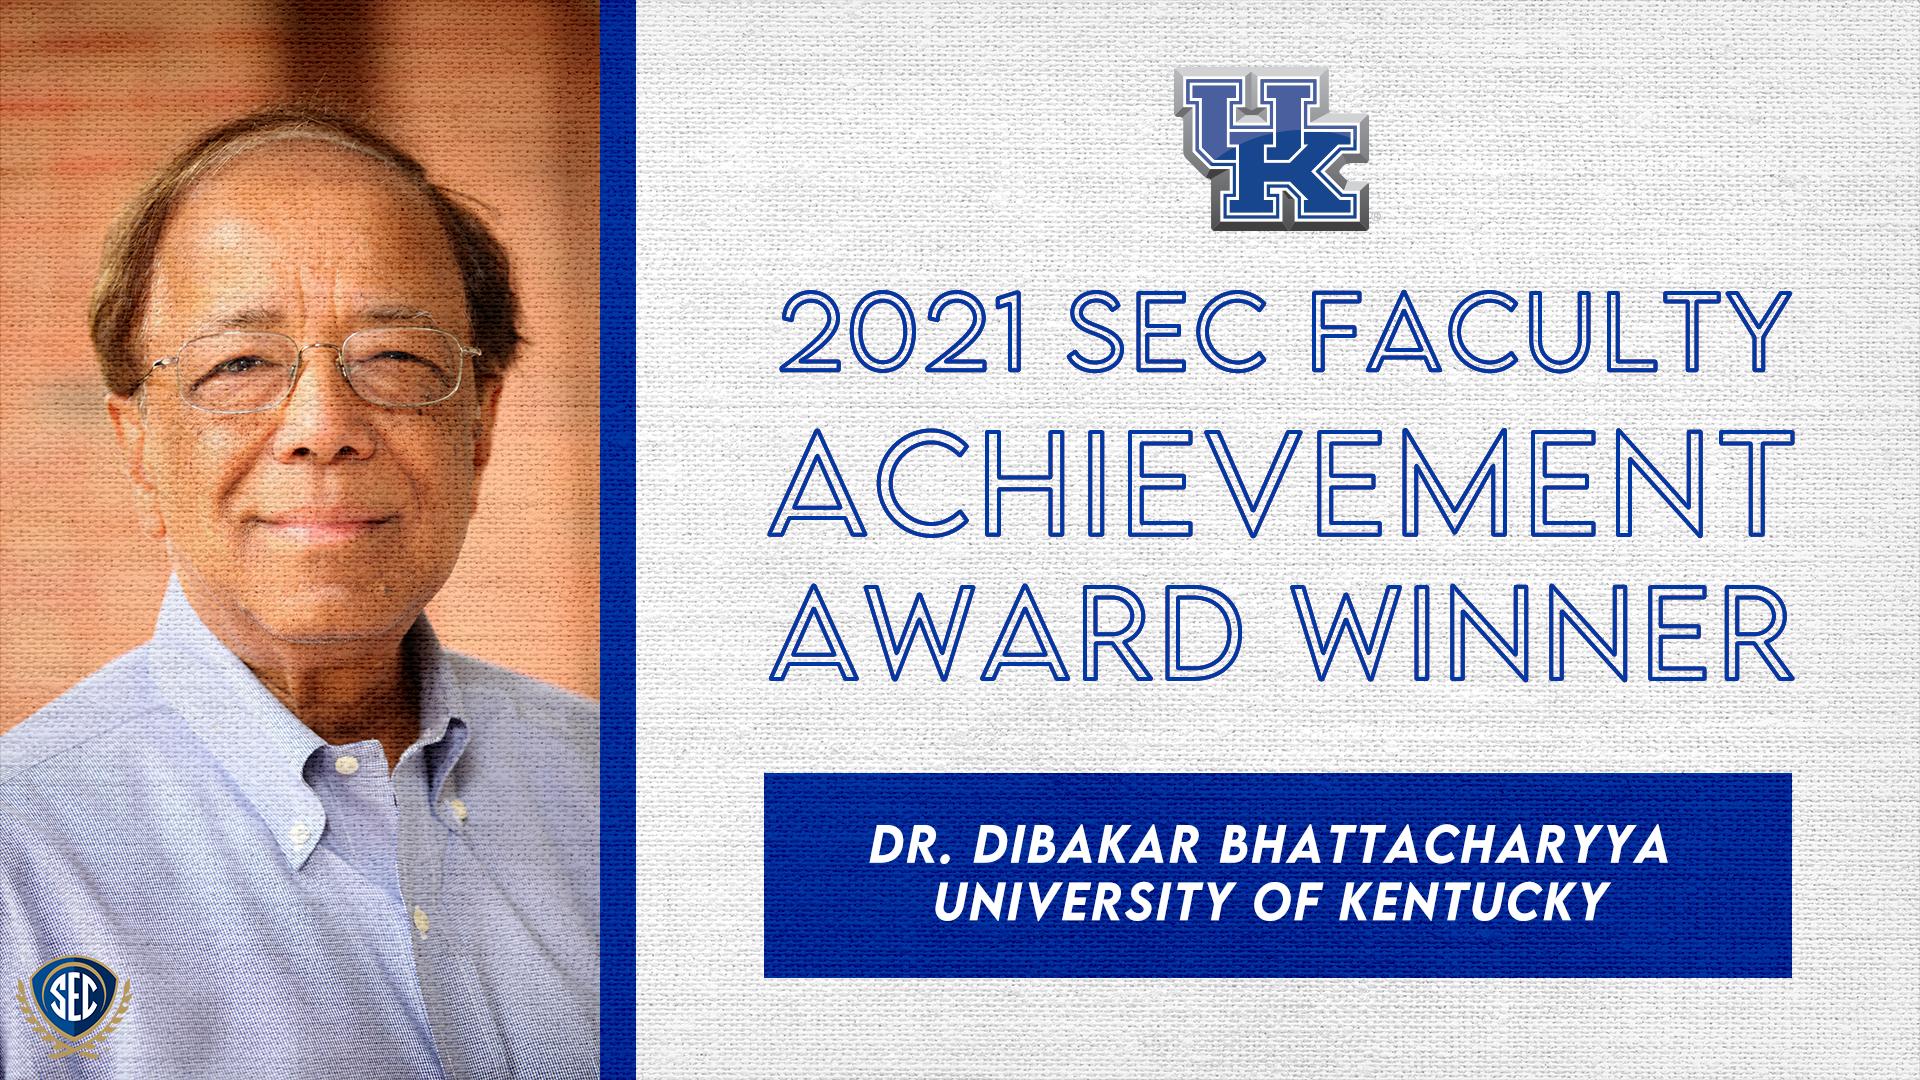 SEC Announces Dr. Dibakar Bhattacharyya Wins 2021 Faculty Achievement Award for University of Kentucky